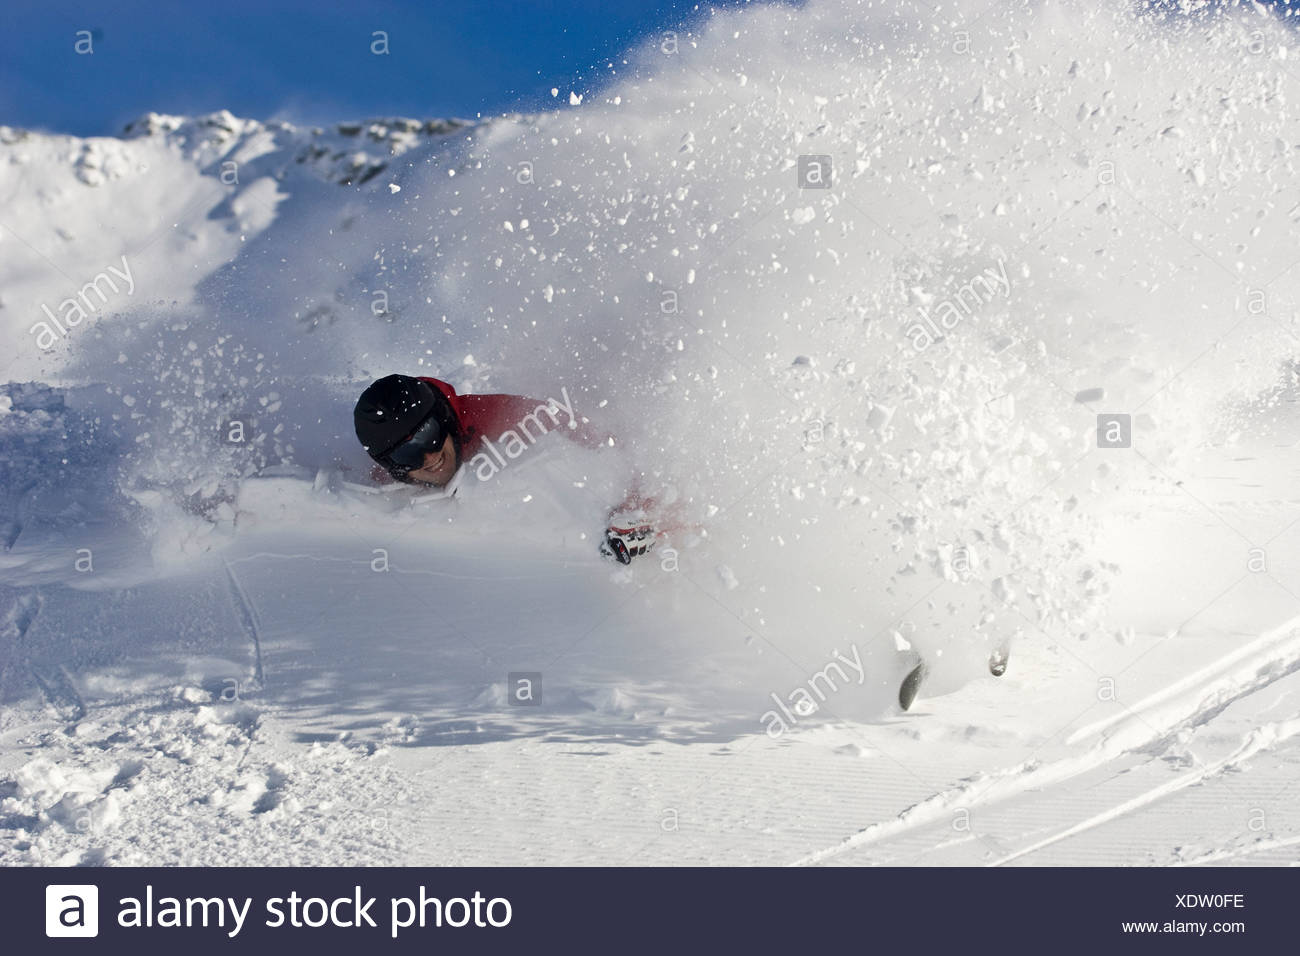 Fall, Lintel, skiing, risk, sport, injury, violation, skiing, man, fall, ski, ski accident, accident, casualty, powder snow, sno - Stock Image